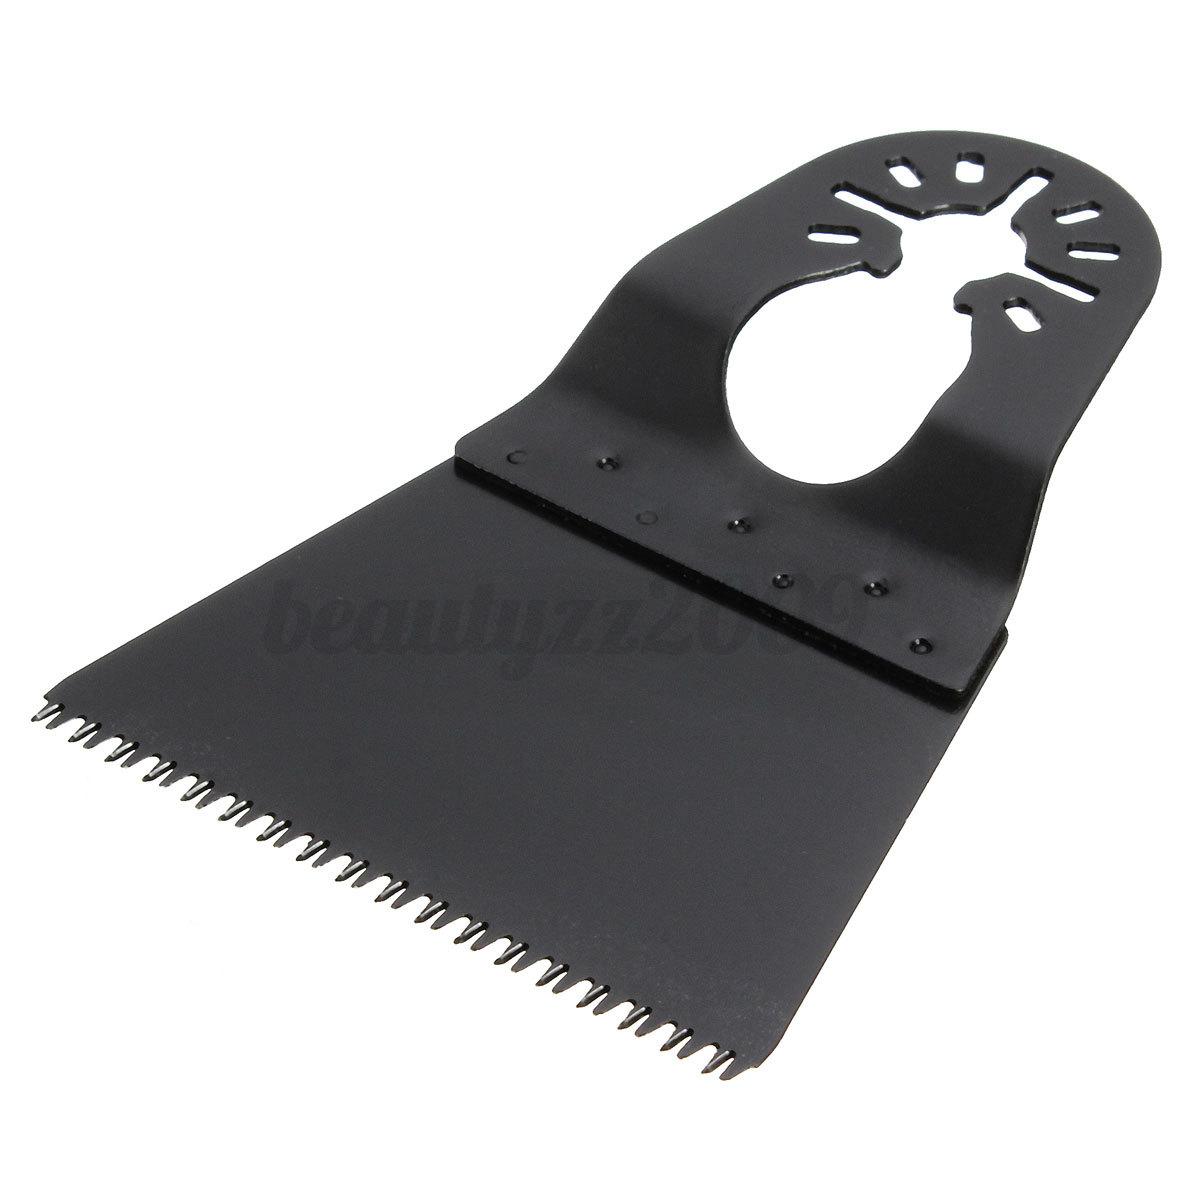 2 10pcs mix oscillating tool saw blade for fein dremel. Black Bedroom Furniture Sets. Home Design Ideas